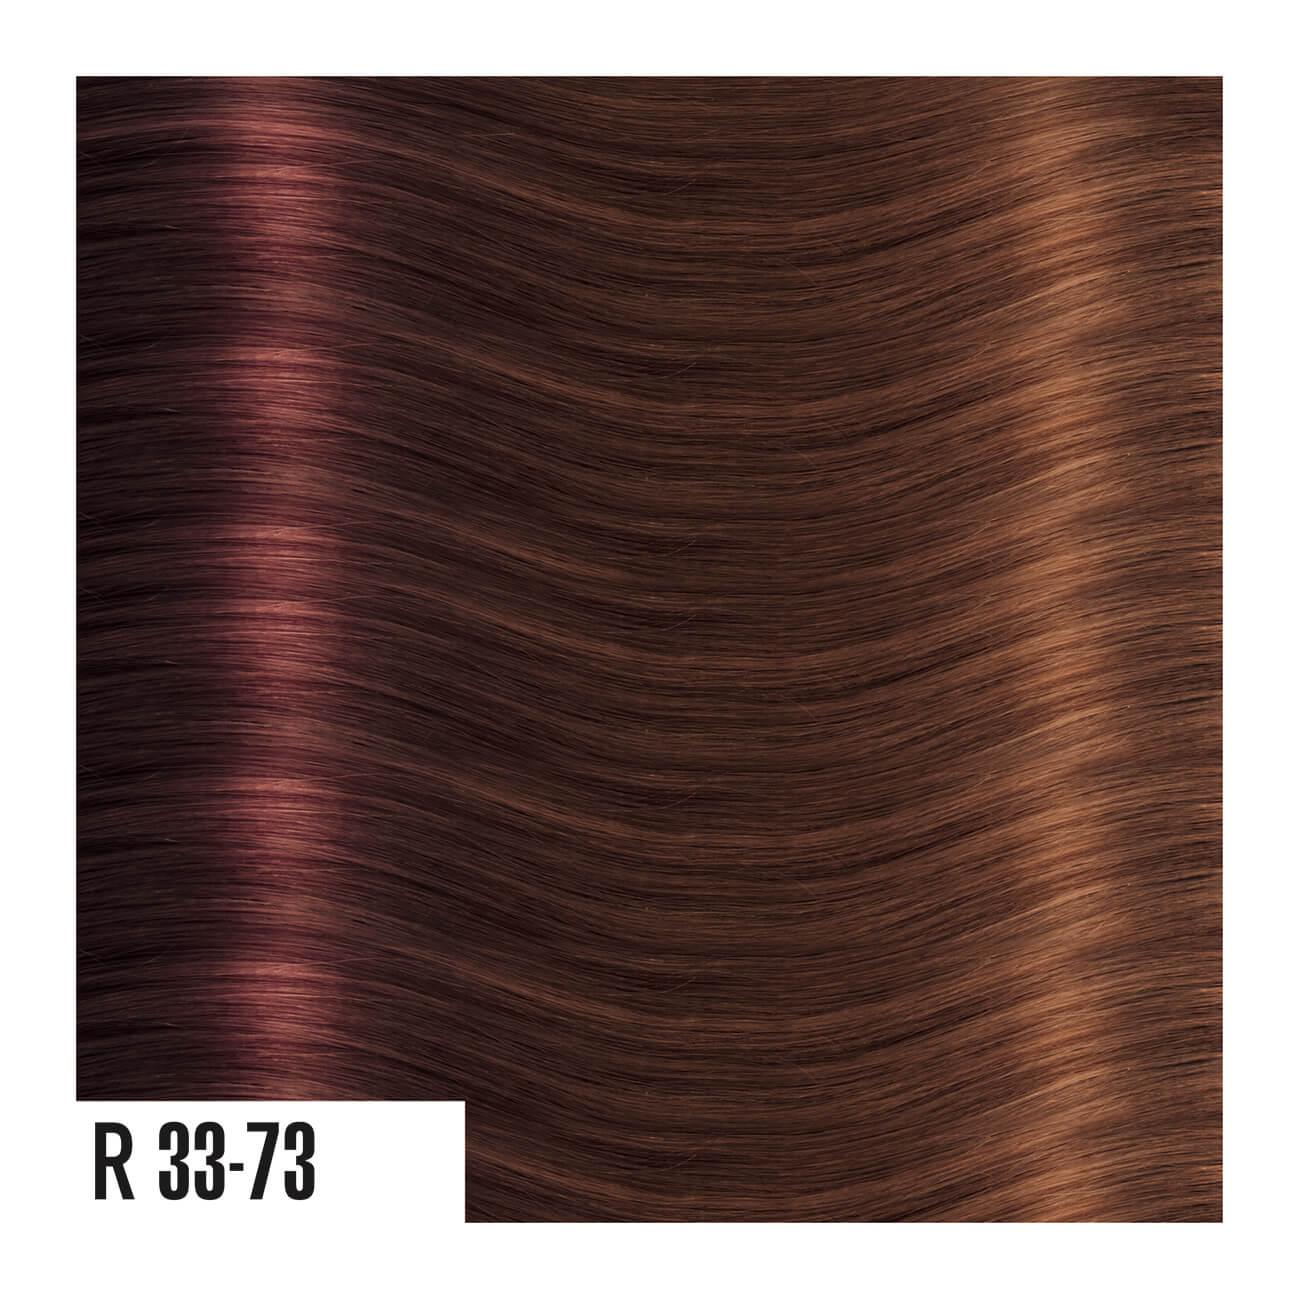 r33-73